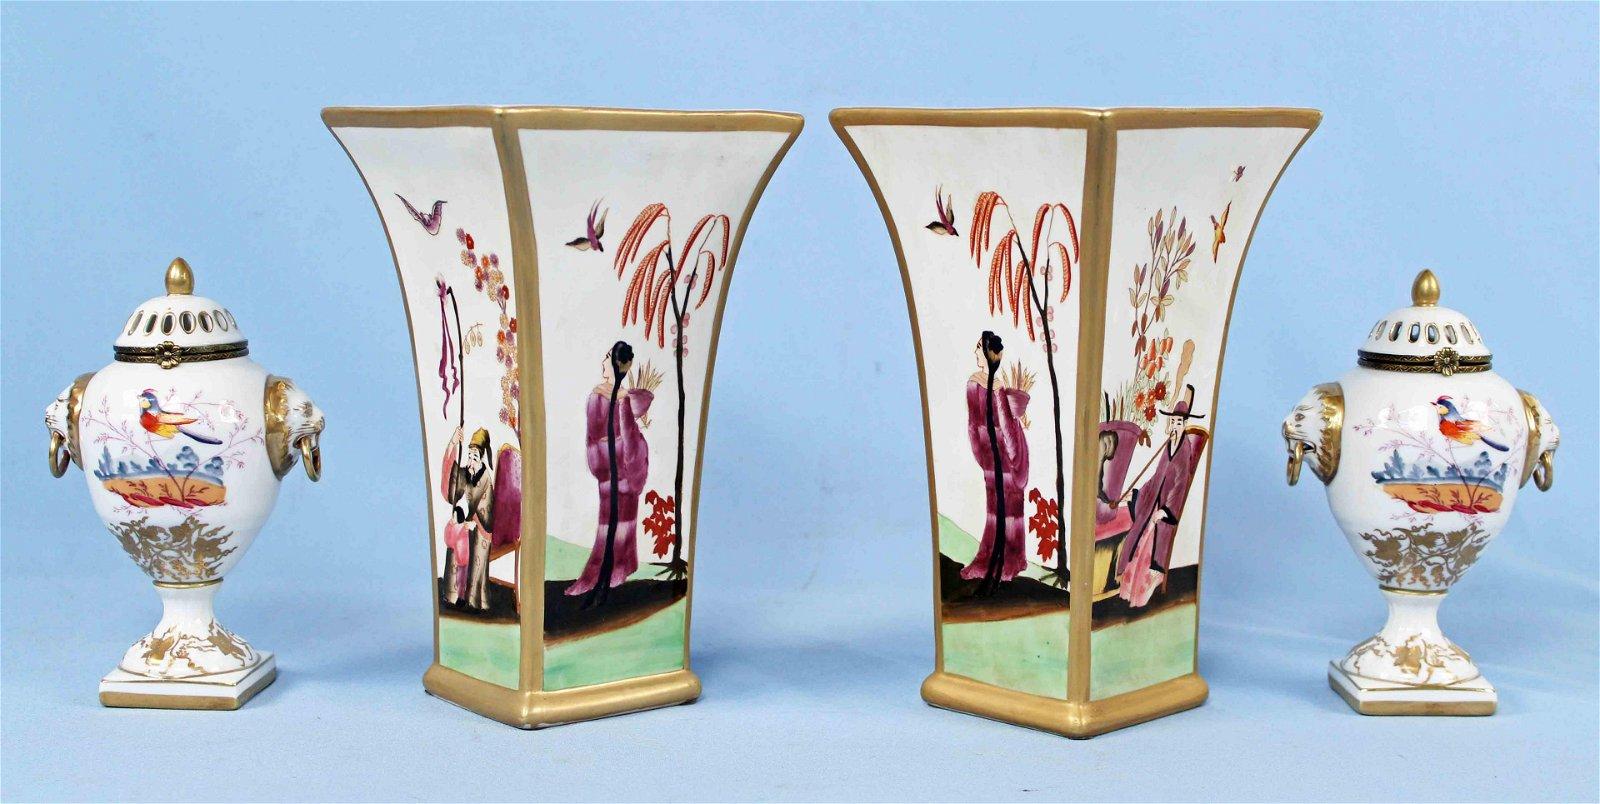 Chelsea House Porcelain 2 Vases & 2 Urns